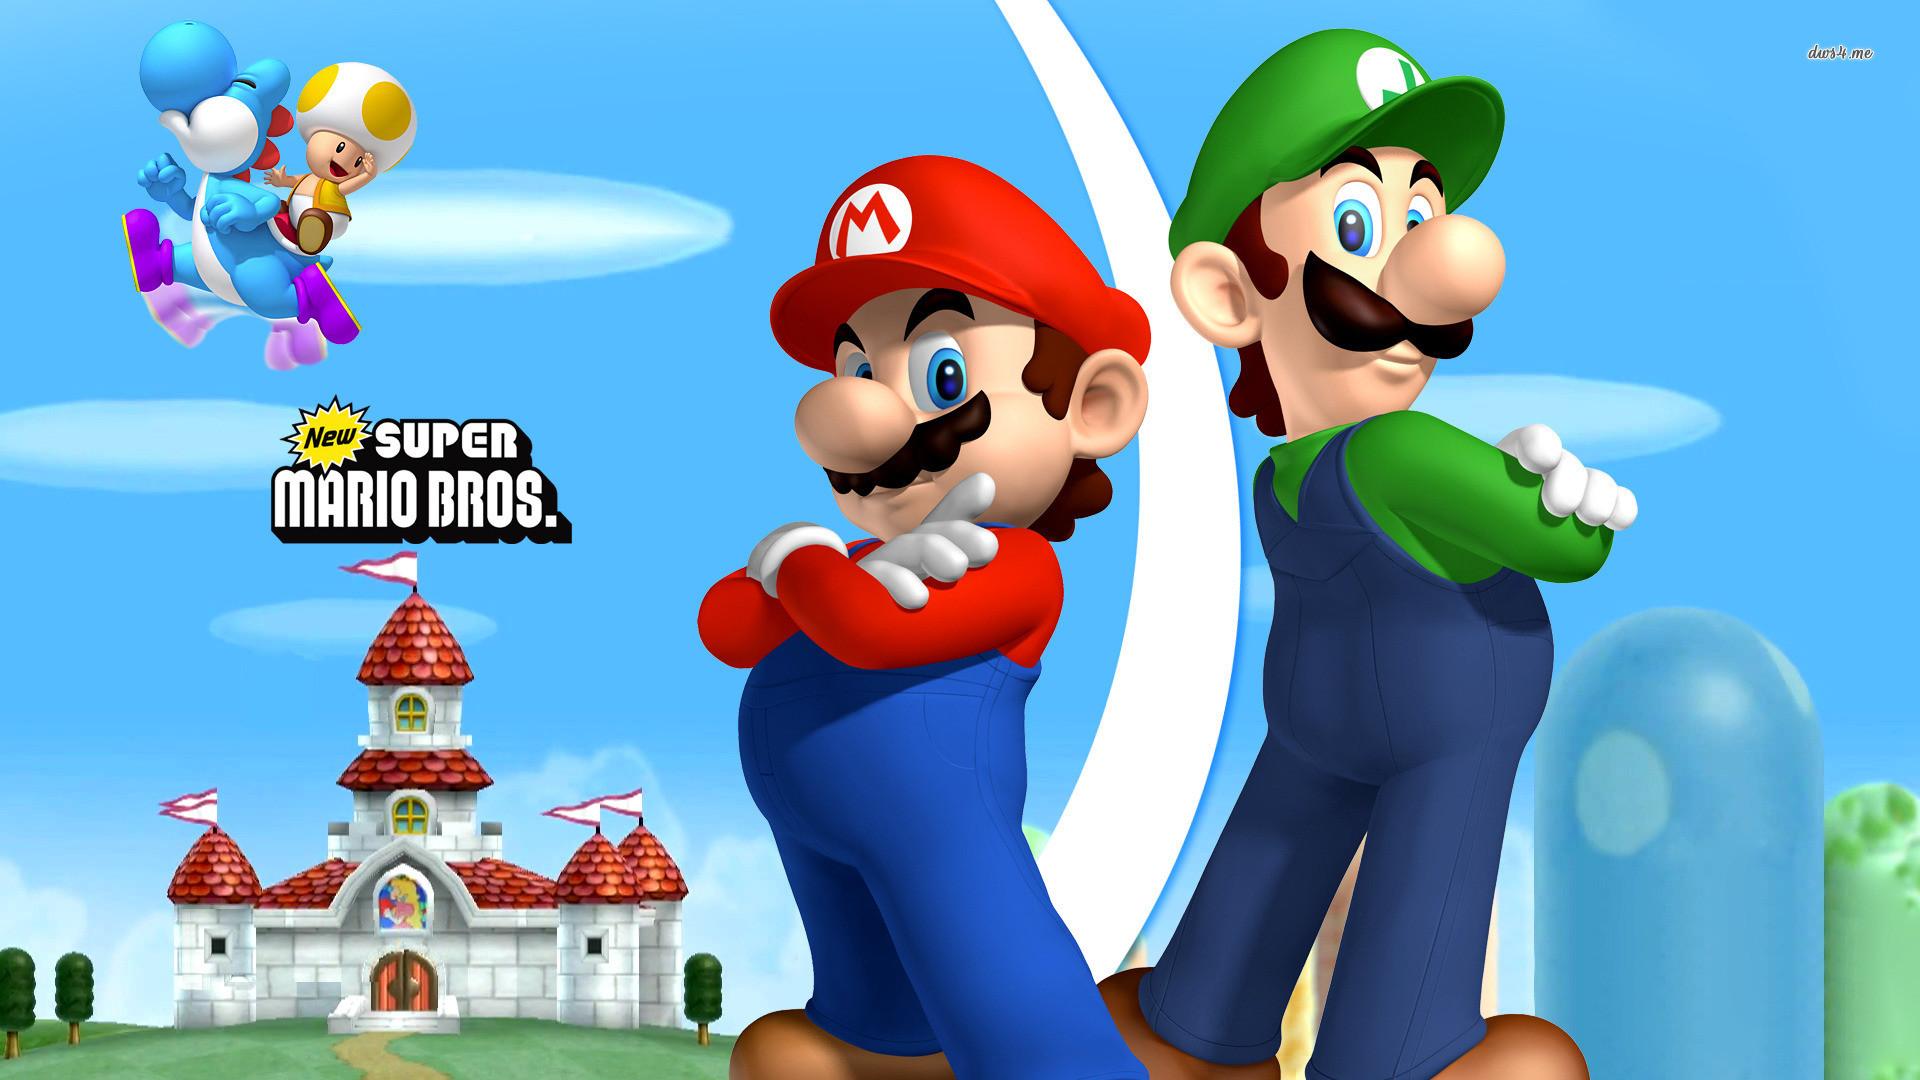 Mario and Luigi HD Wallpaper #4997